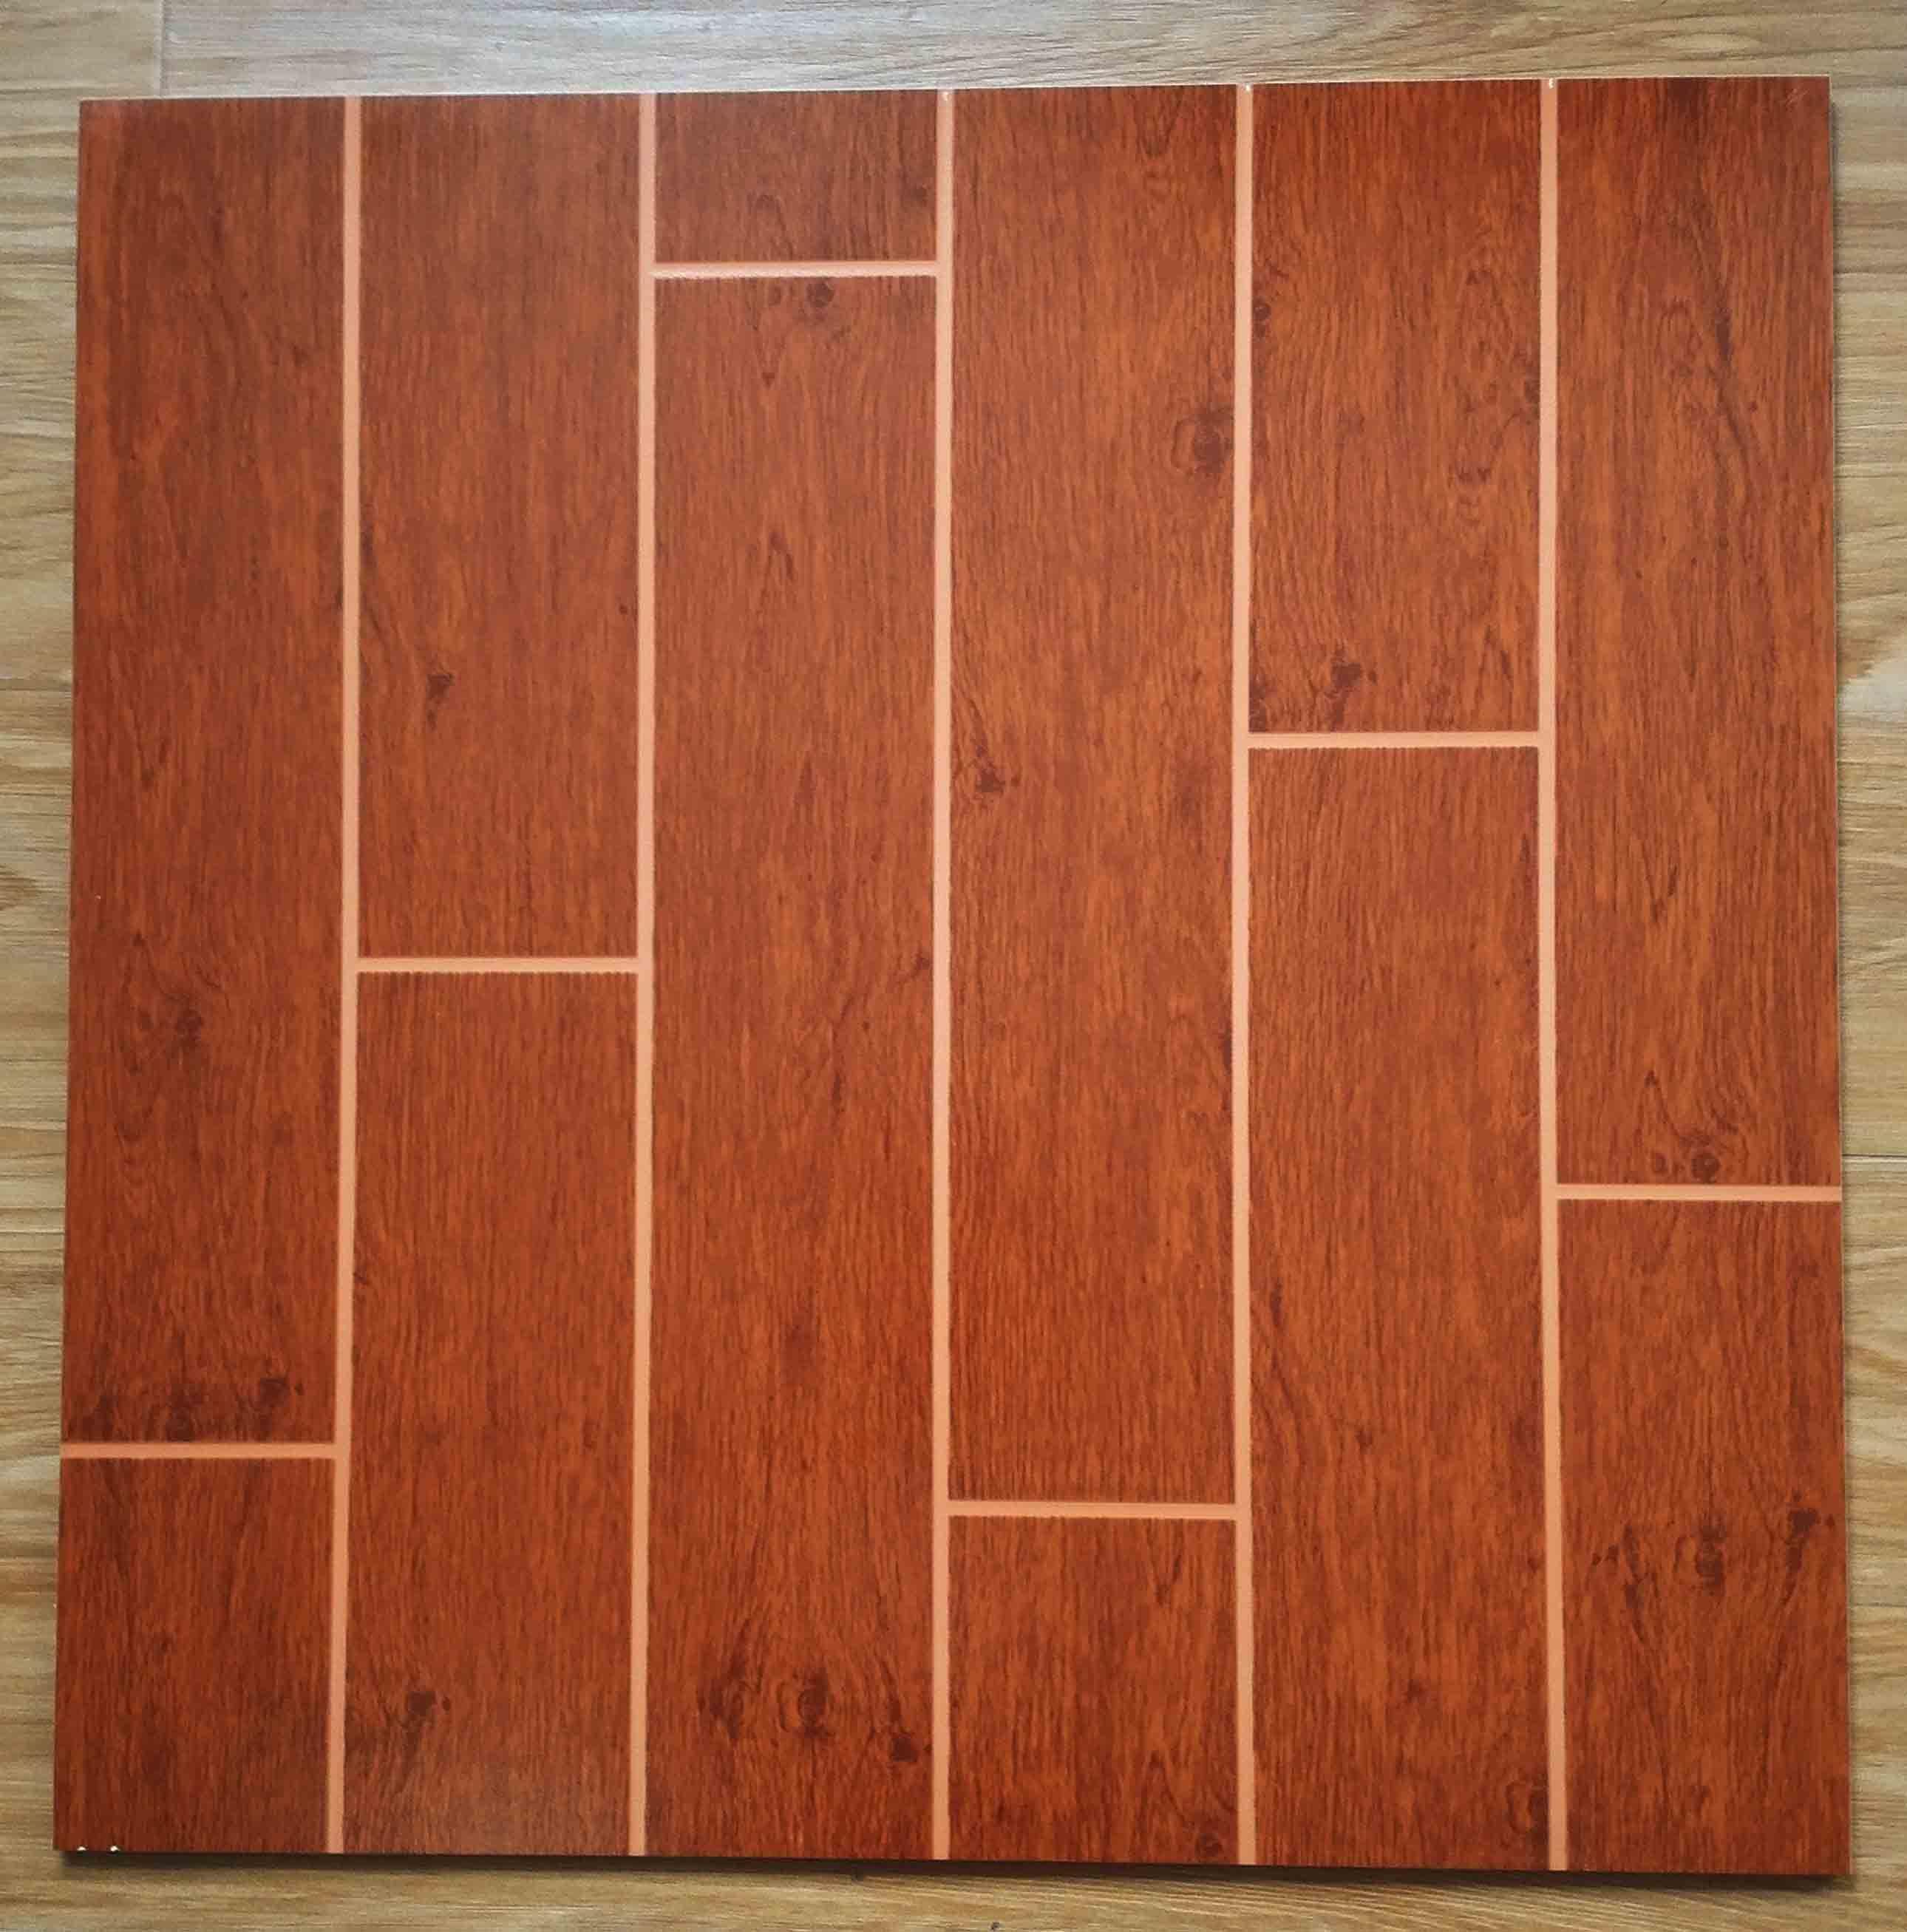 China rustic tilefloor tilebuilding materialflooringtiles rustic tilefloor tilebuilding materialflooringtilesceramic tileporcelain tilewall tilematt 6060 dailygadgetfo Choice Image